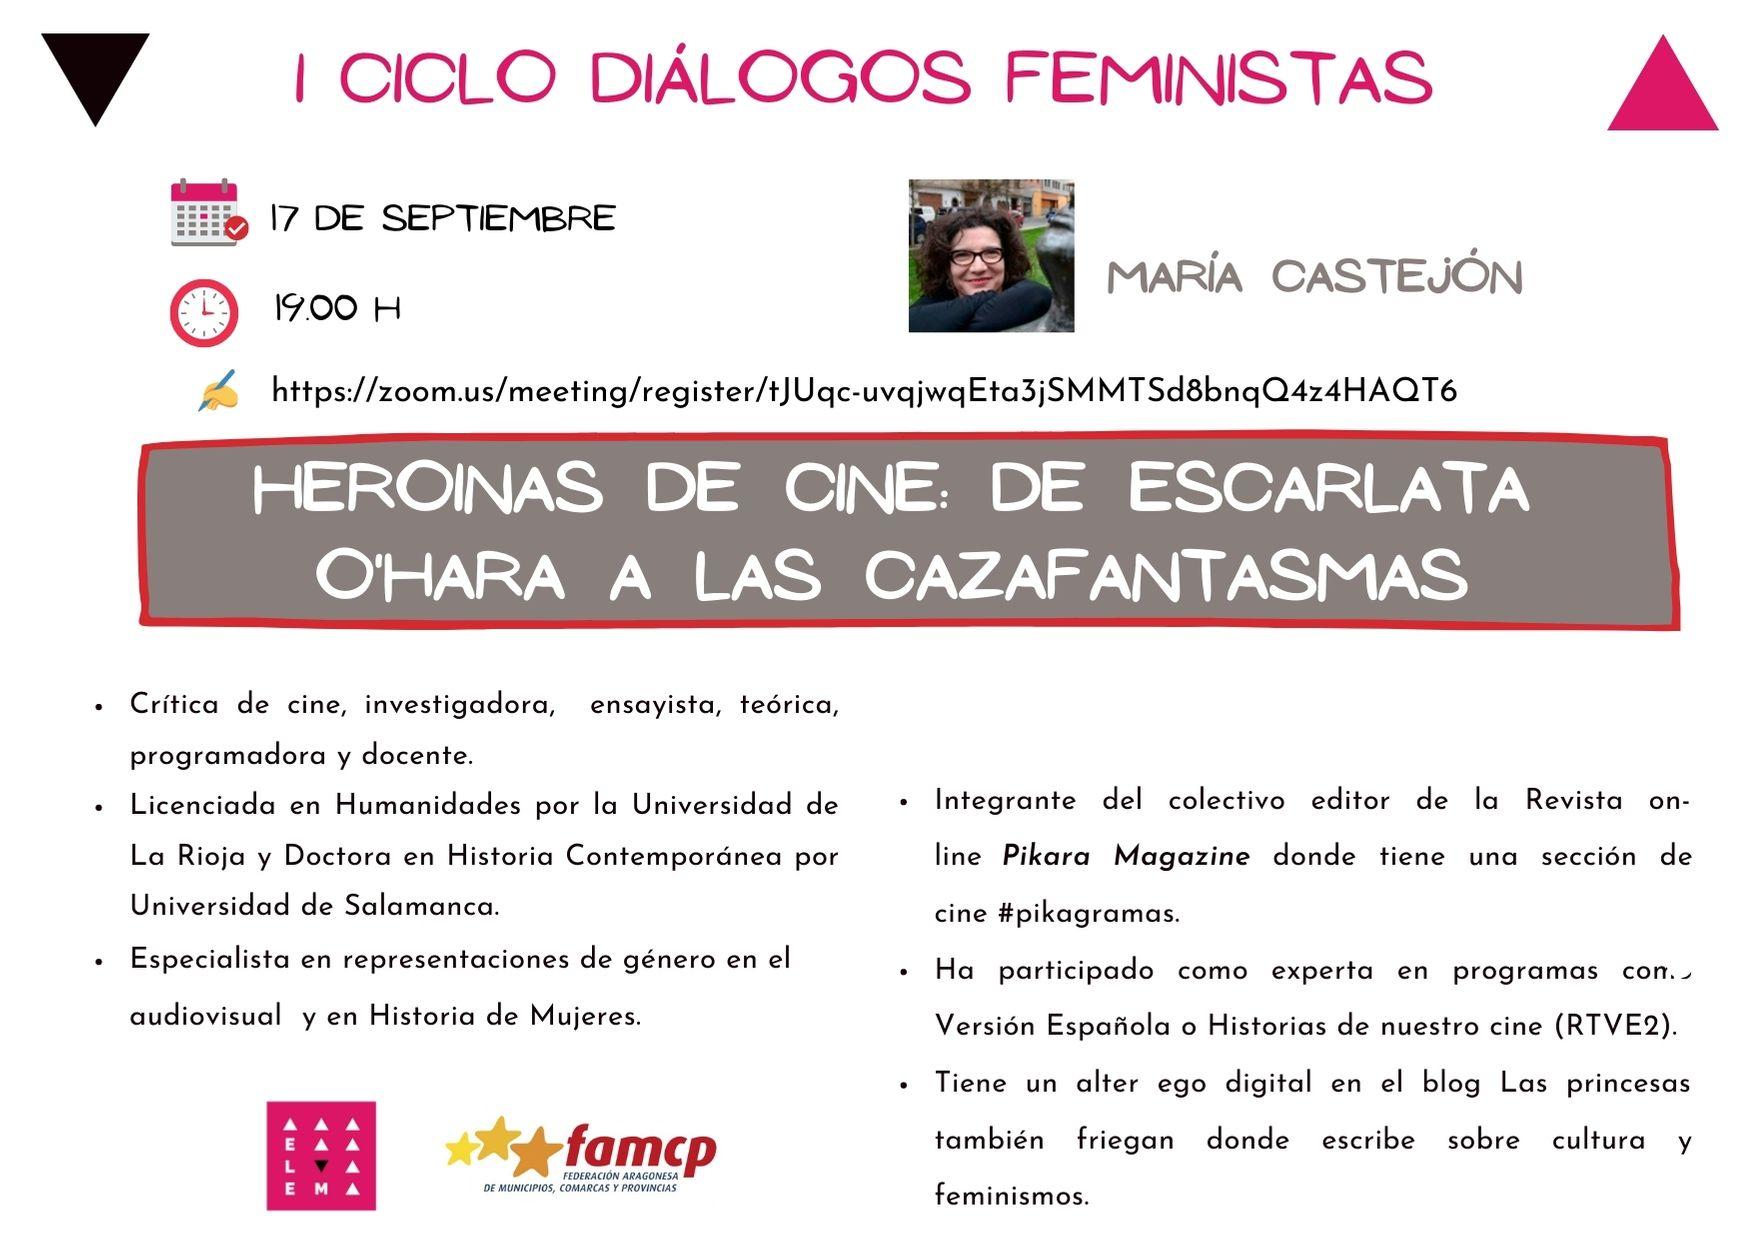 María Castejón Jornadas Feministas